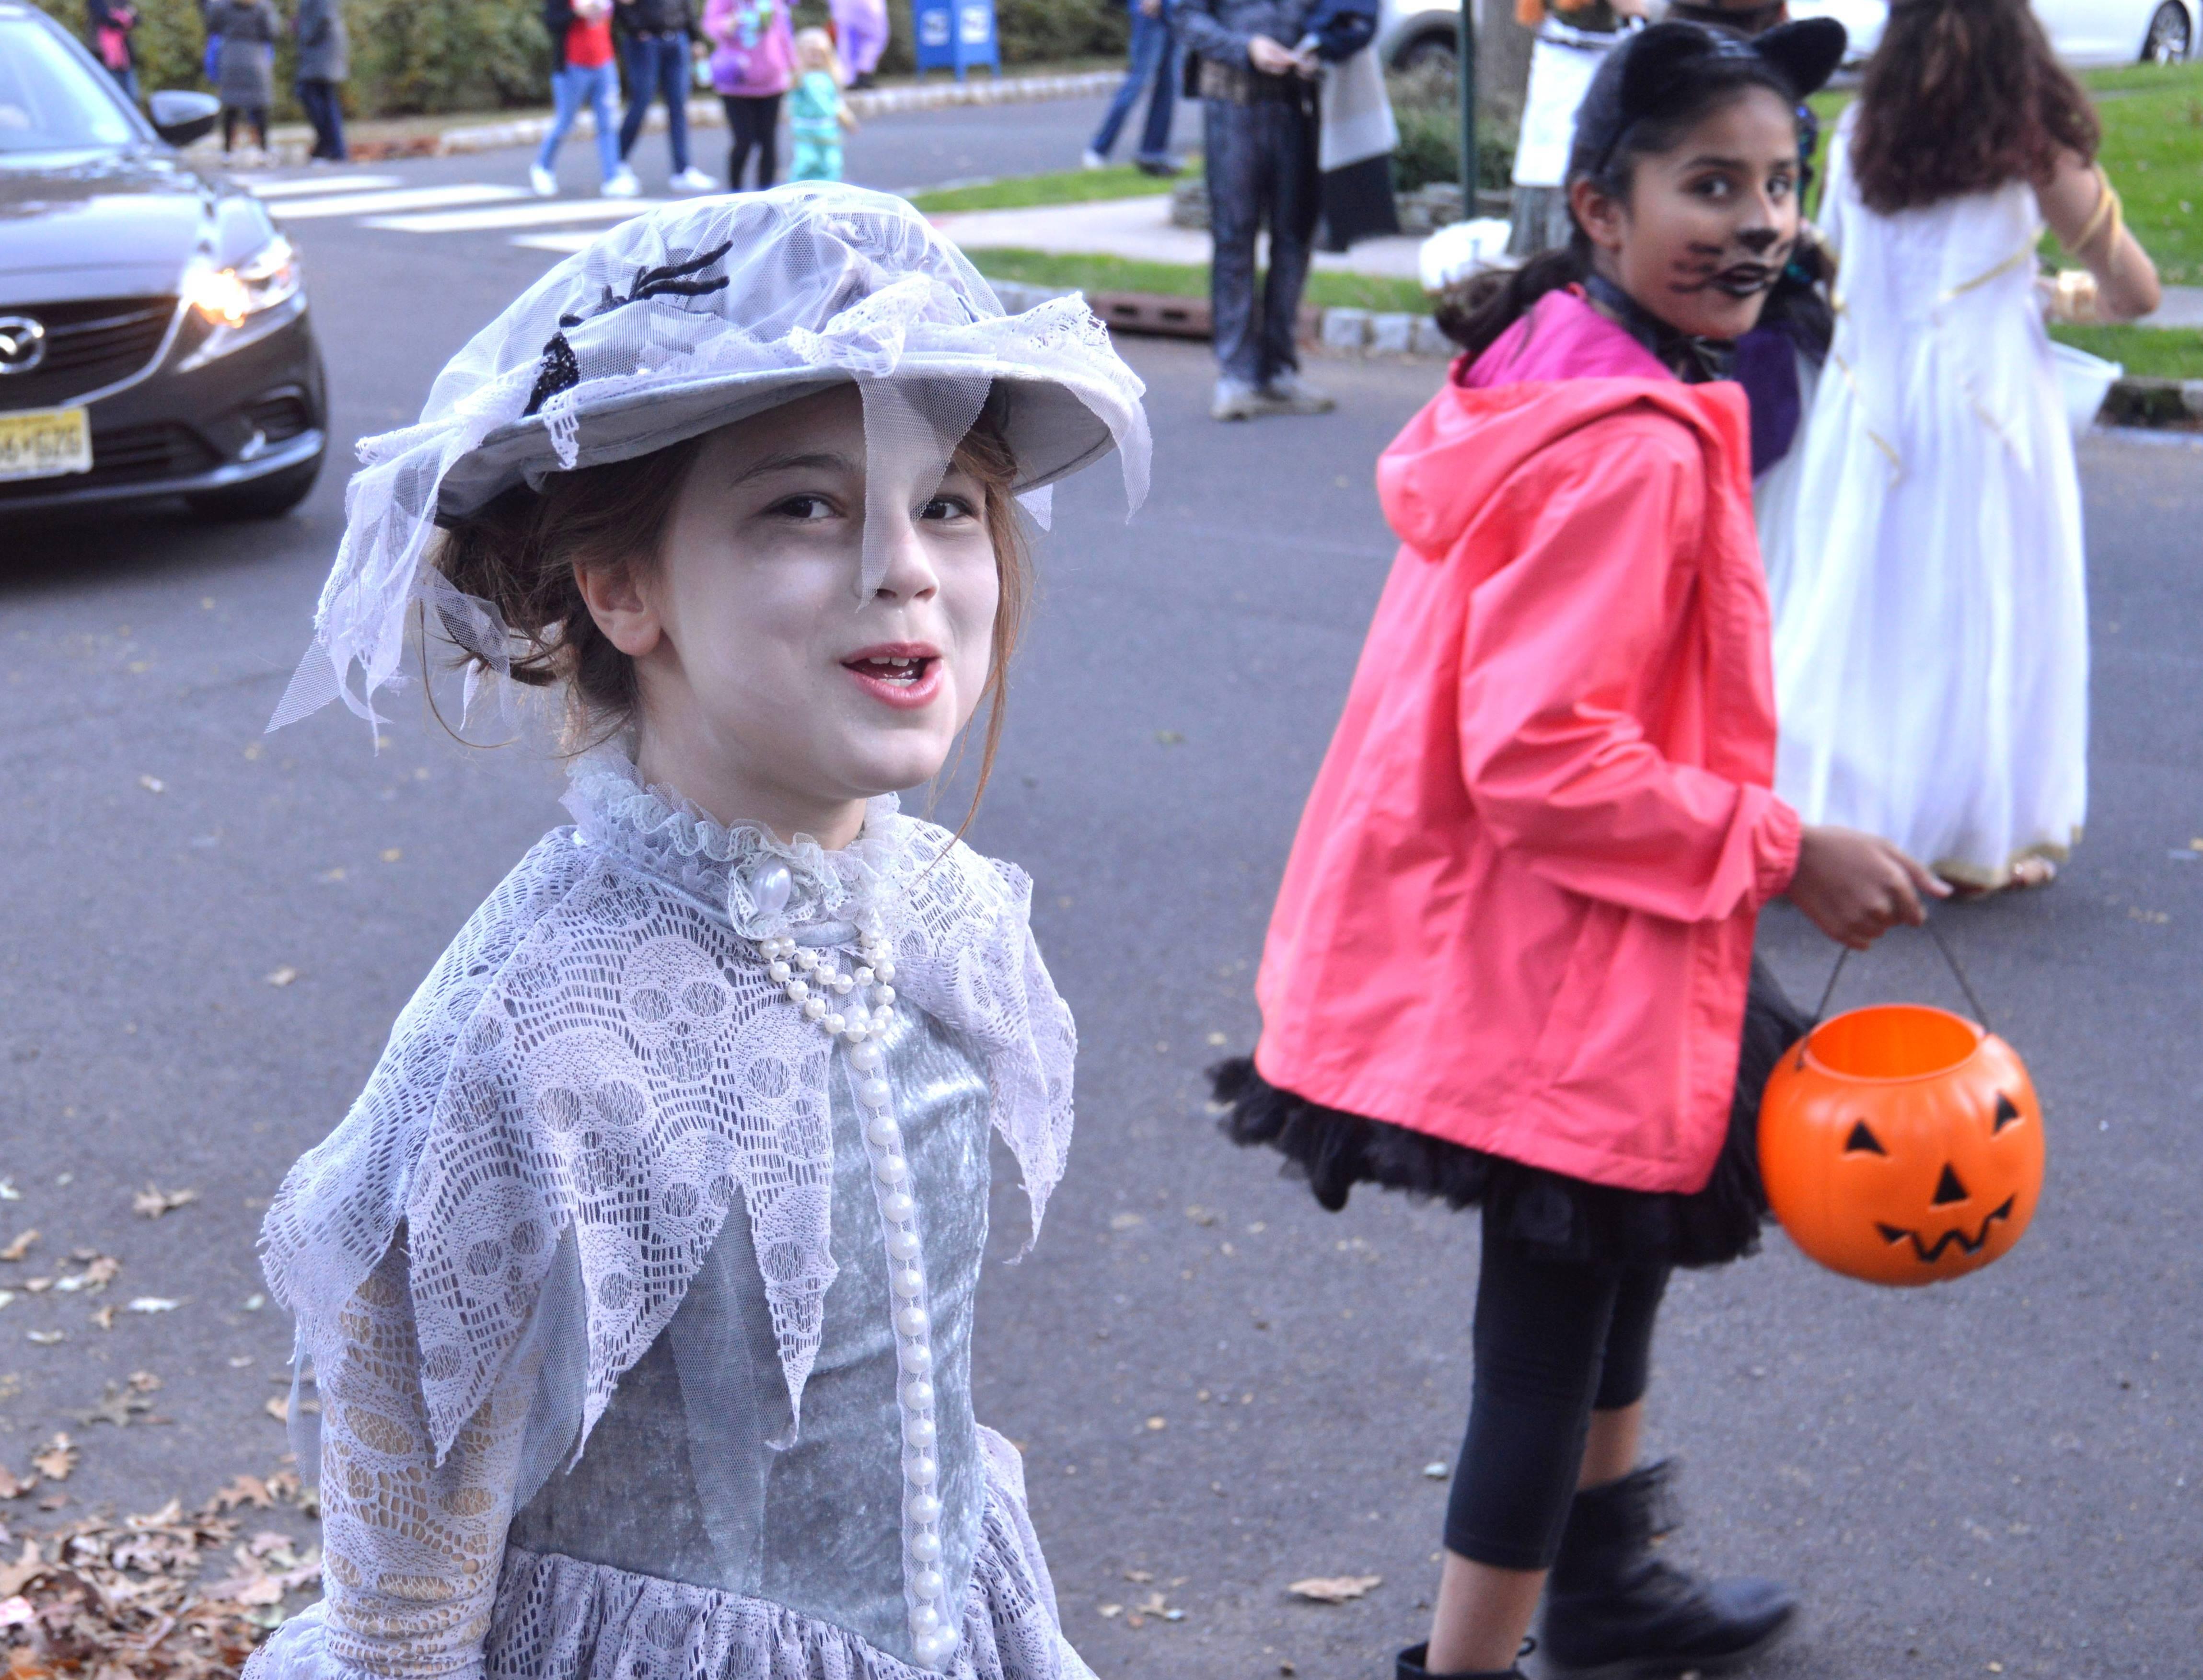 Scenes from Halloween - Fanwood - Scotch Plains/Fanwood NJ News ...